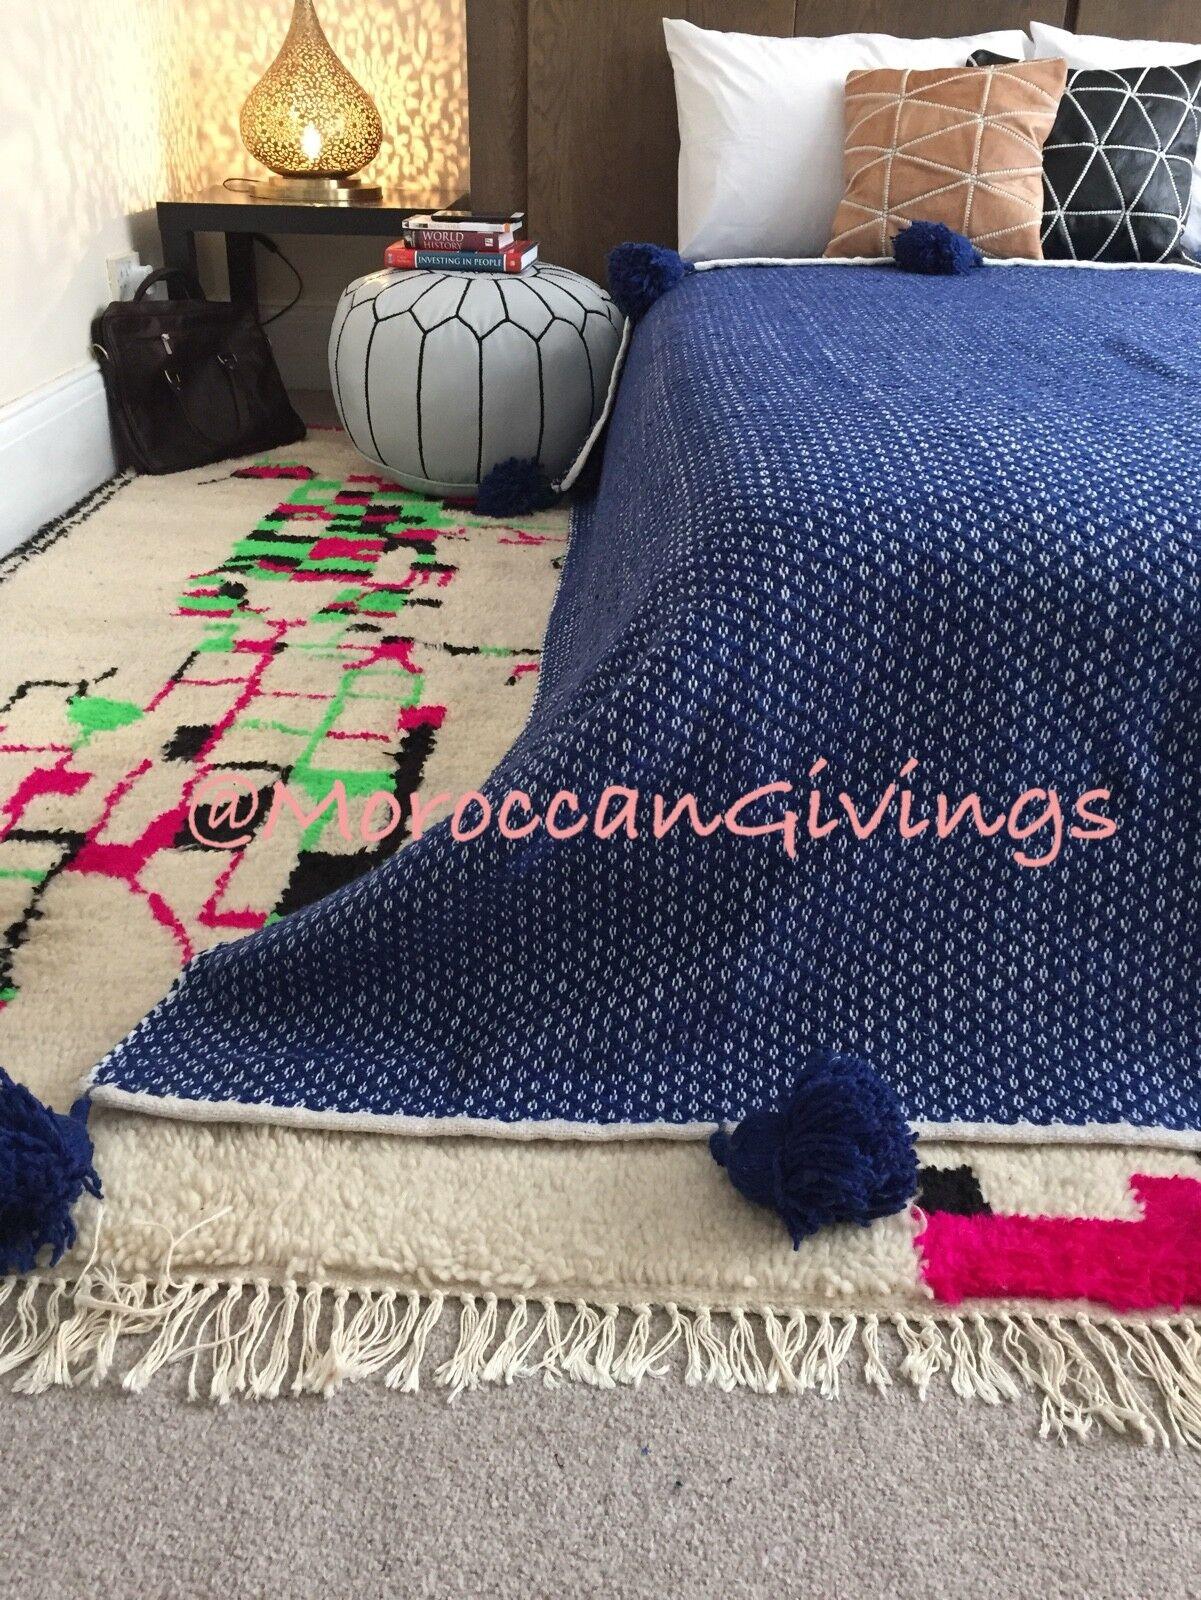 Marroquí tejidos a mano Pom Pom Manta 100% algodón, diseño de puntas 79 Wx118 L 200Wx300L